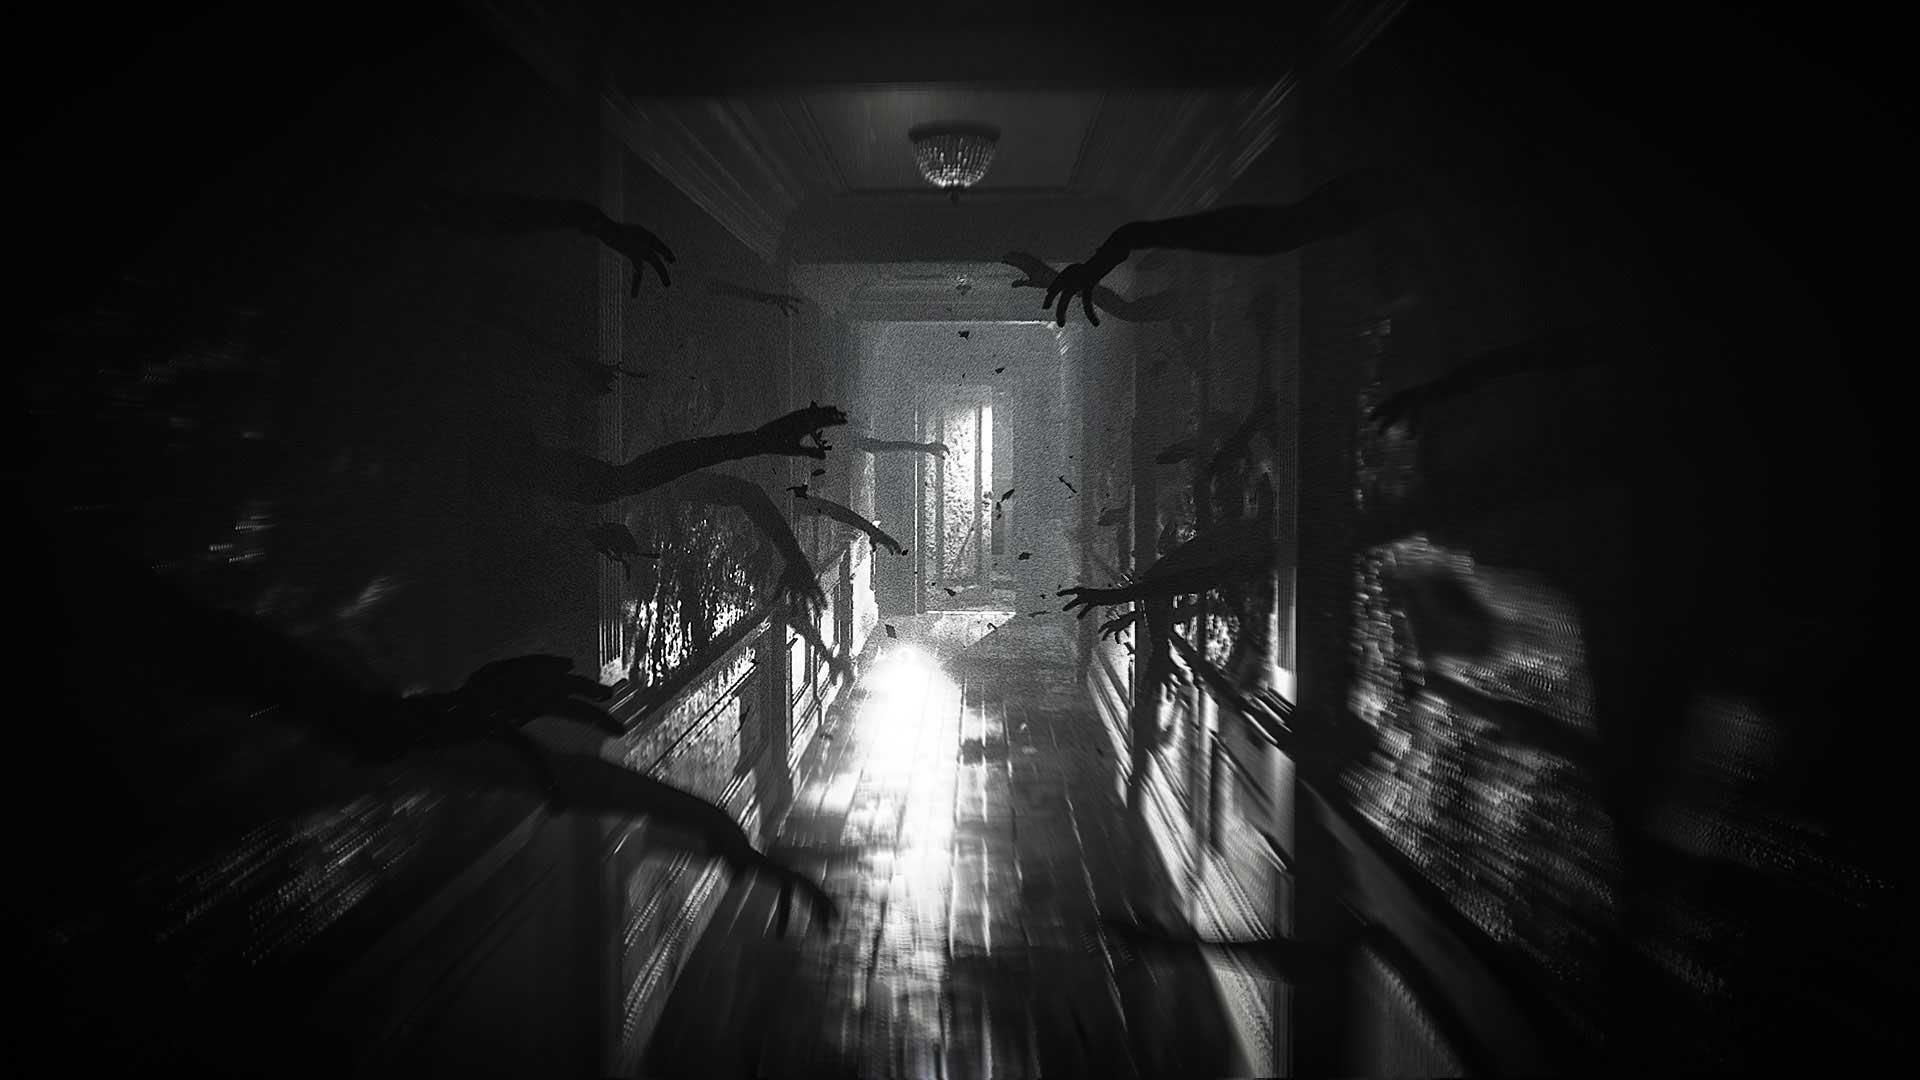 فارسی ساز بازی Layers of Fear 2